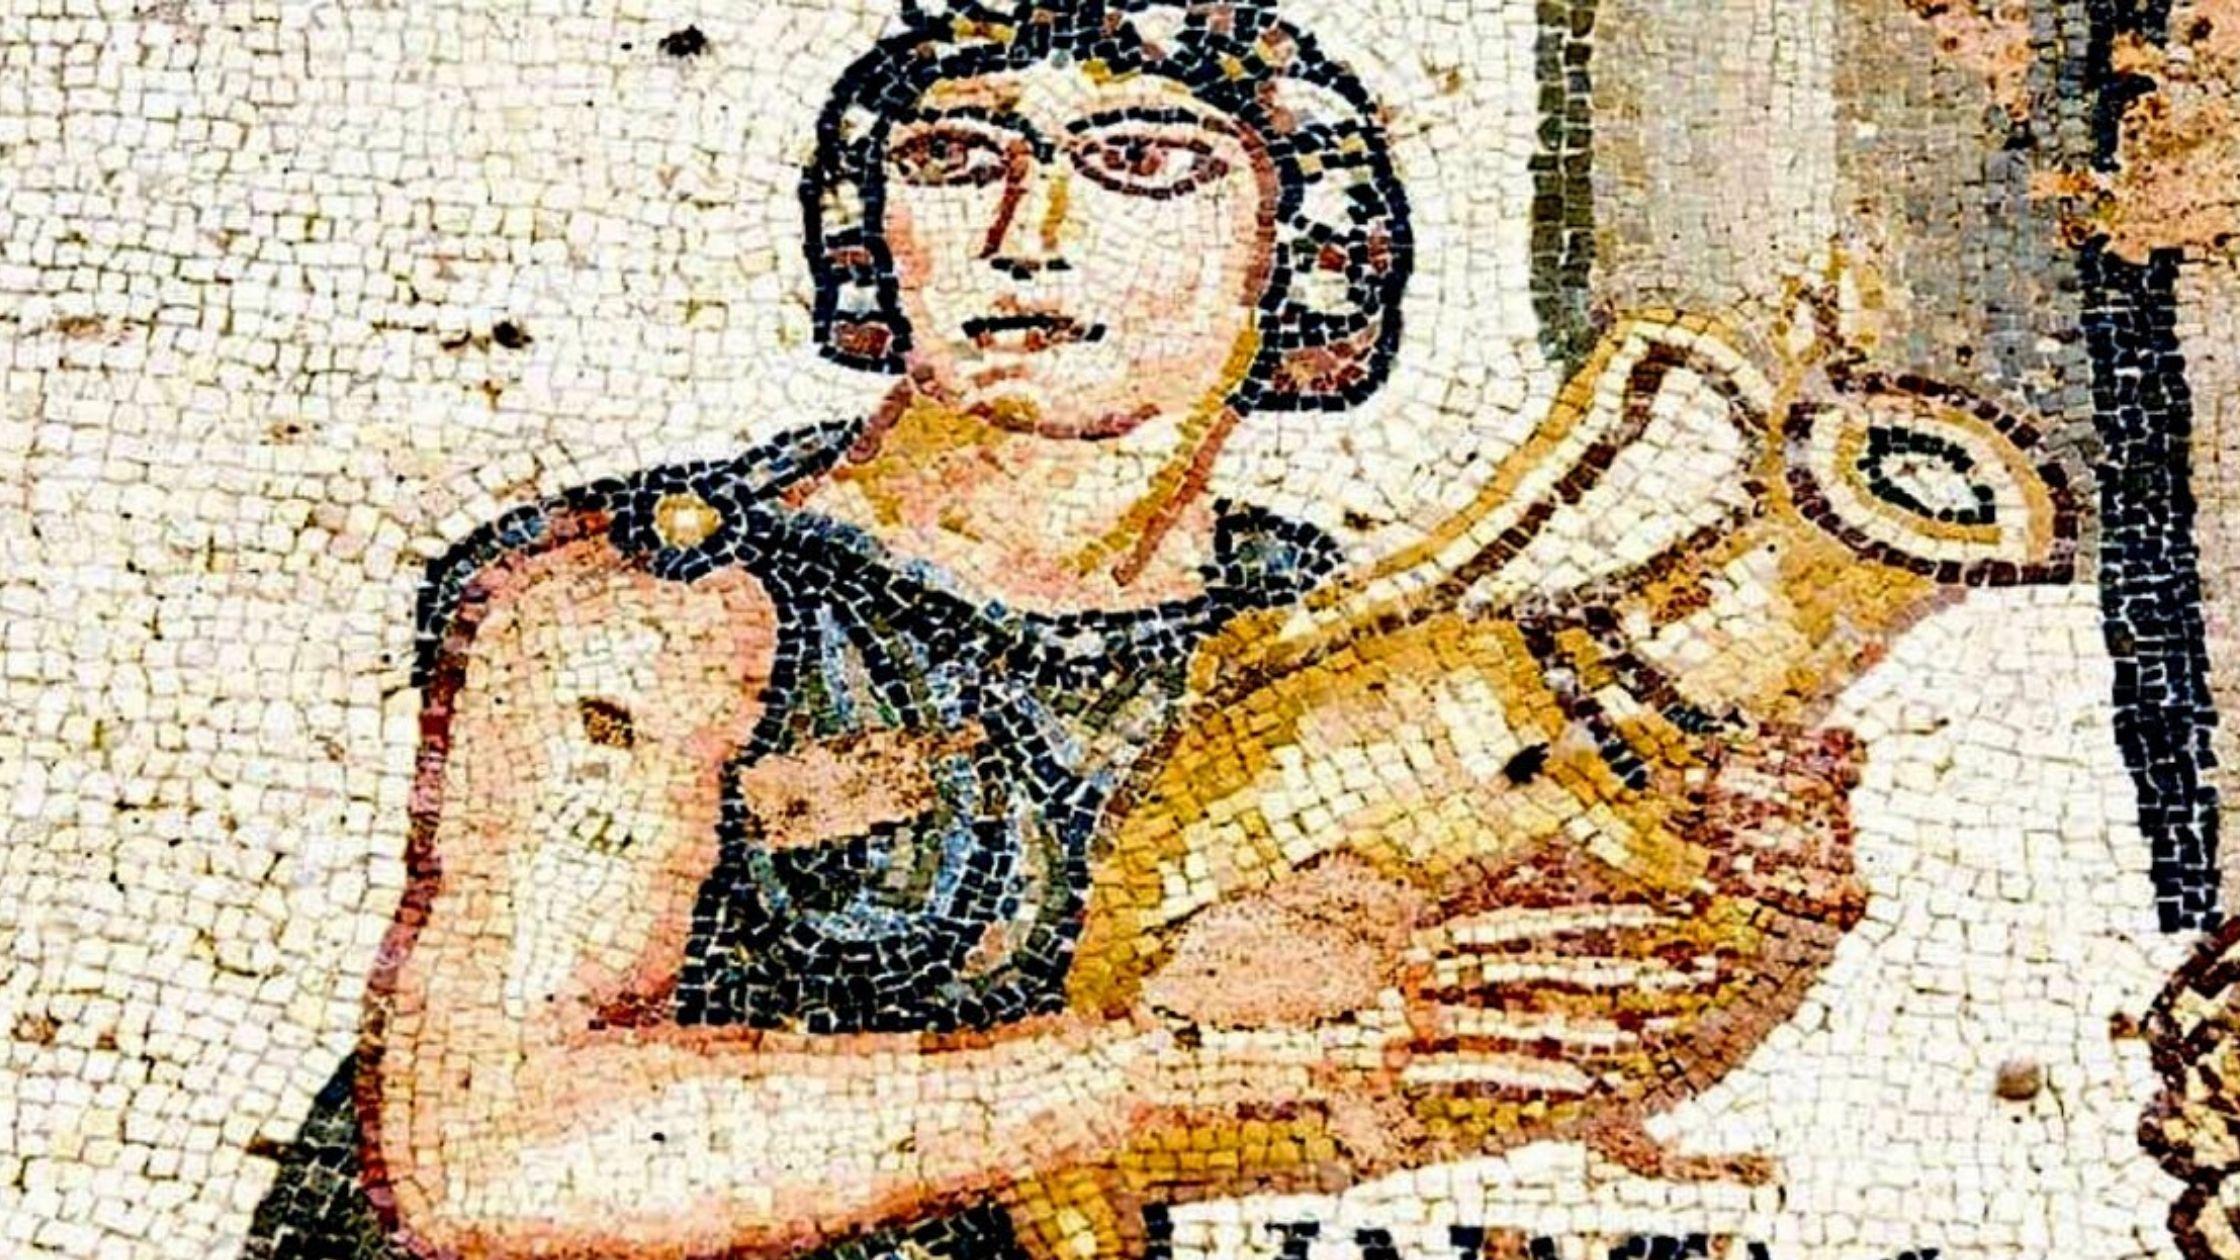 La cultura del vino a lo largo de la historia